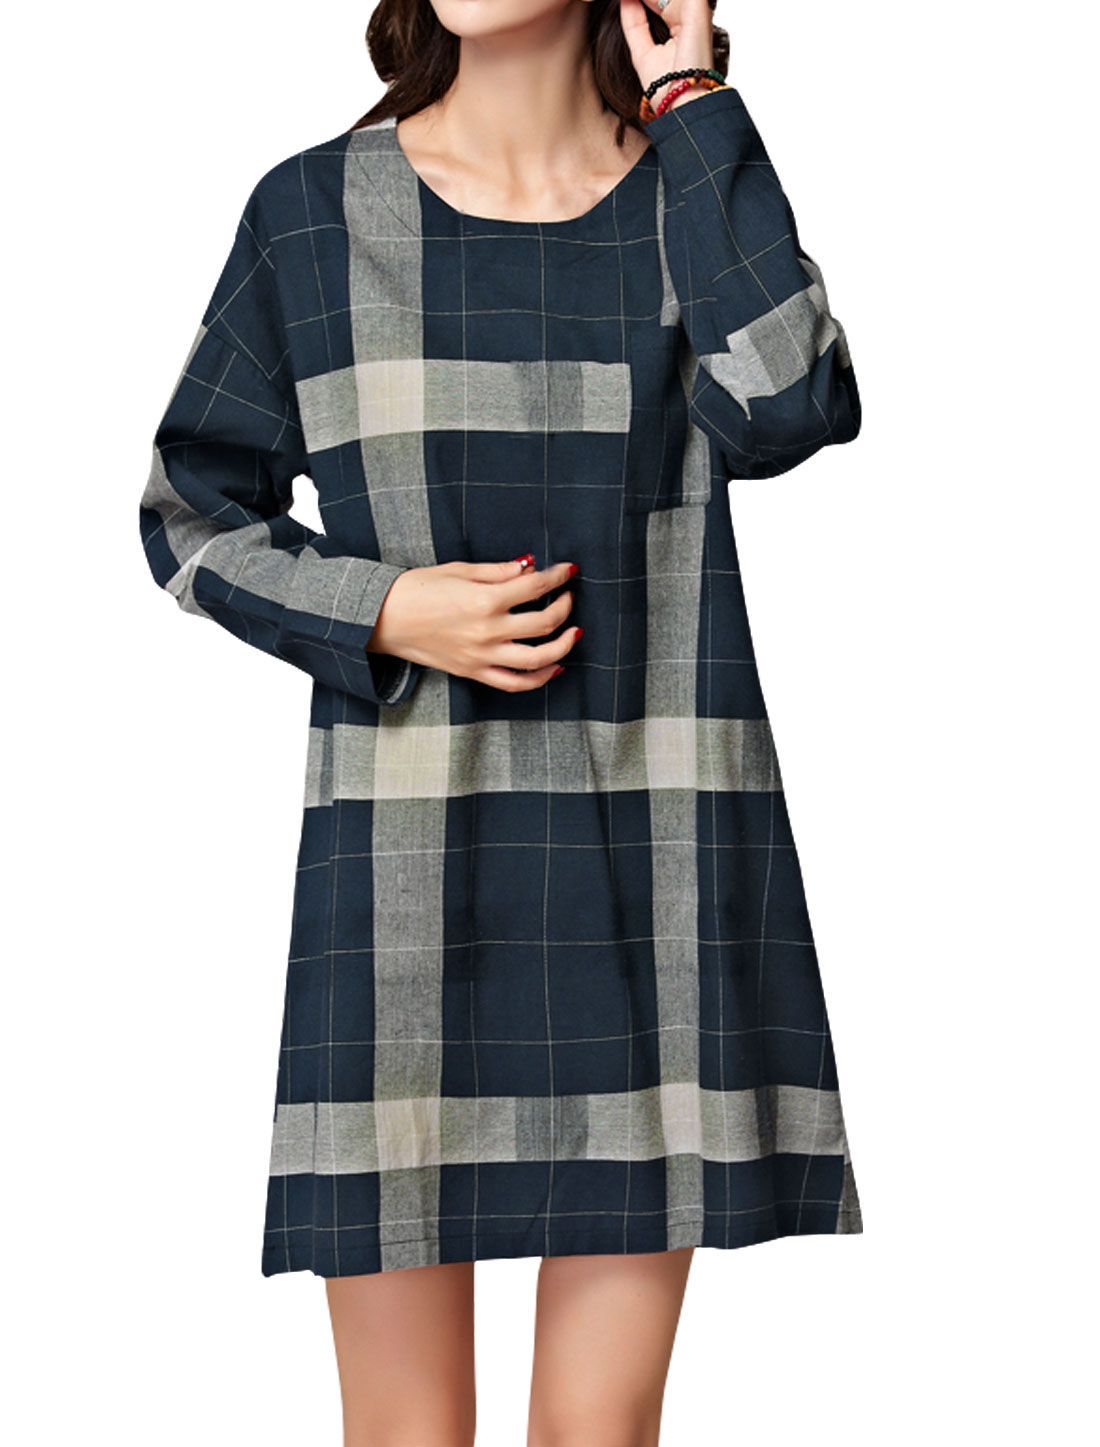 Women Round Neck Chest Pocket Plaids Tunic Dress Blue S